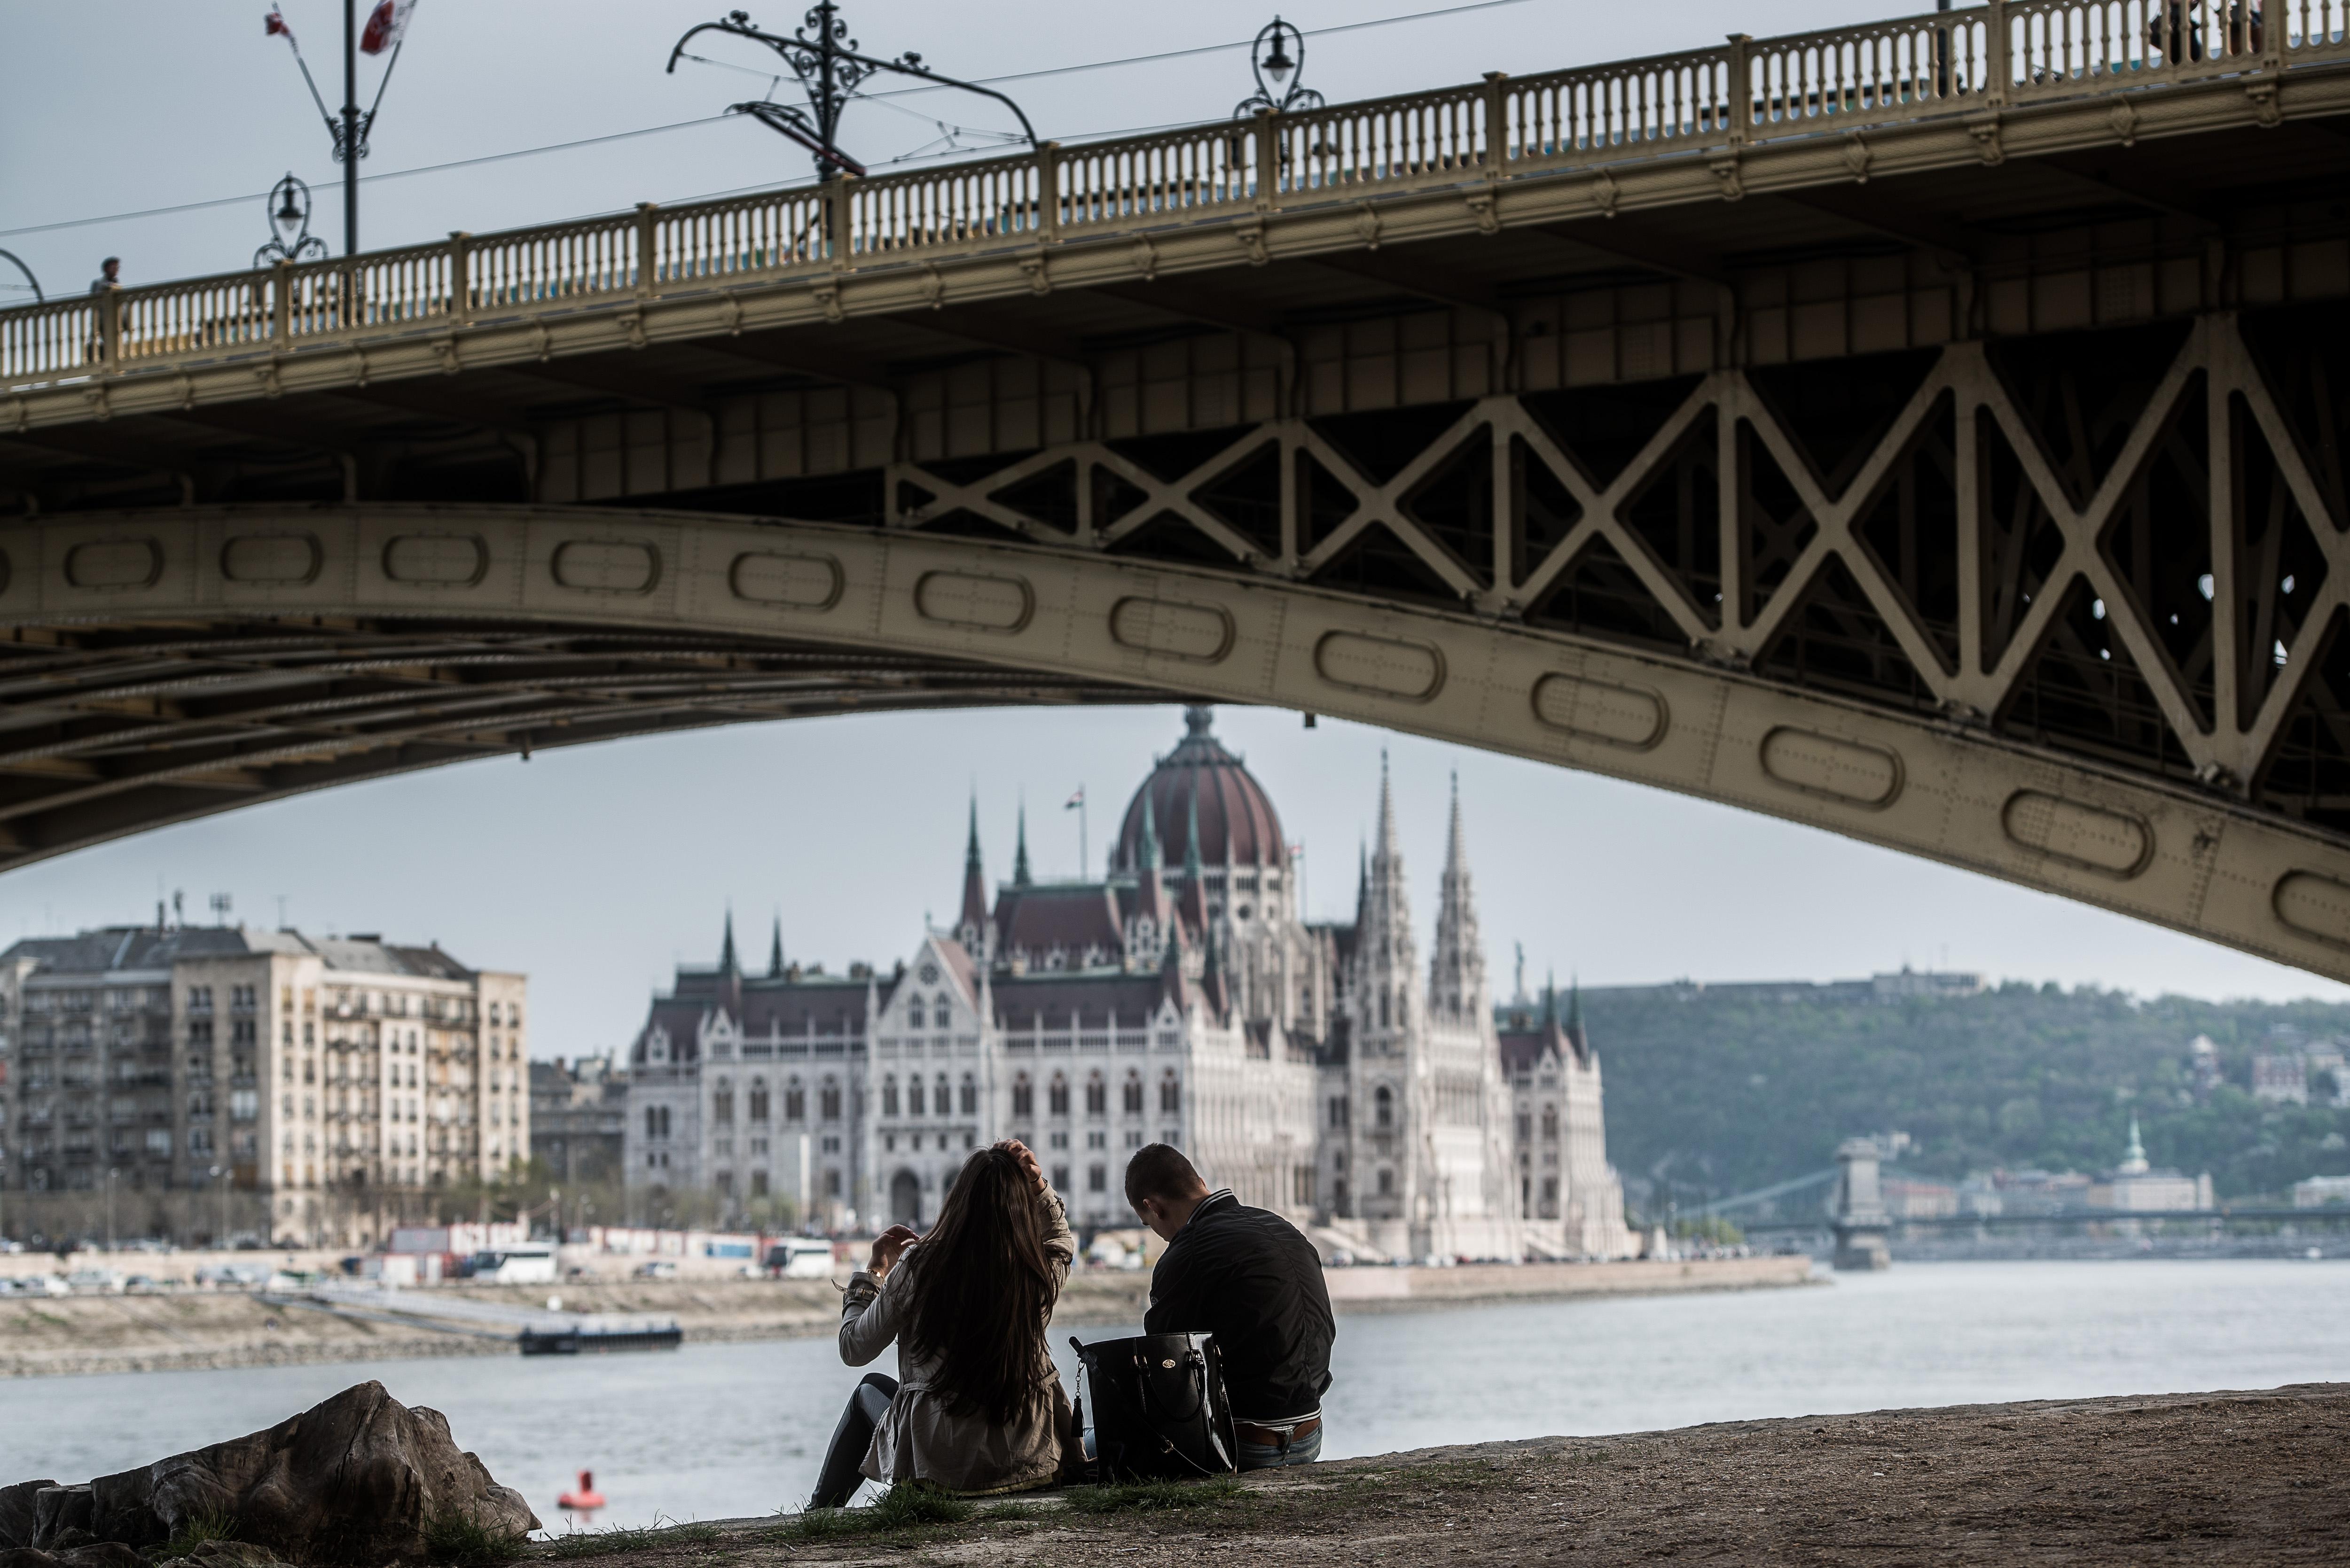 SQJ_1604_Danube_Island_04.jpg